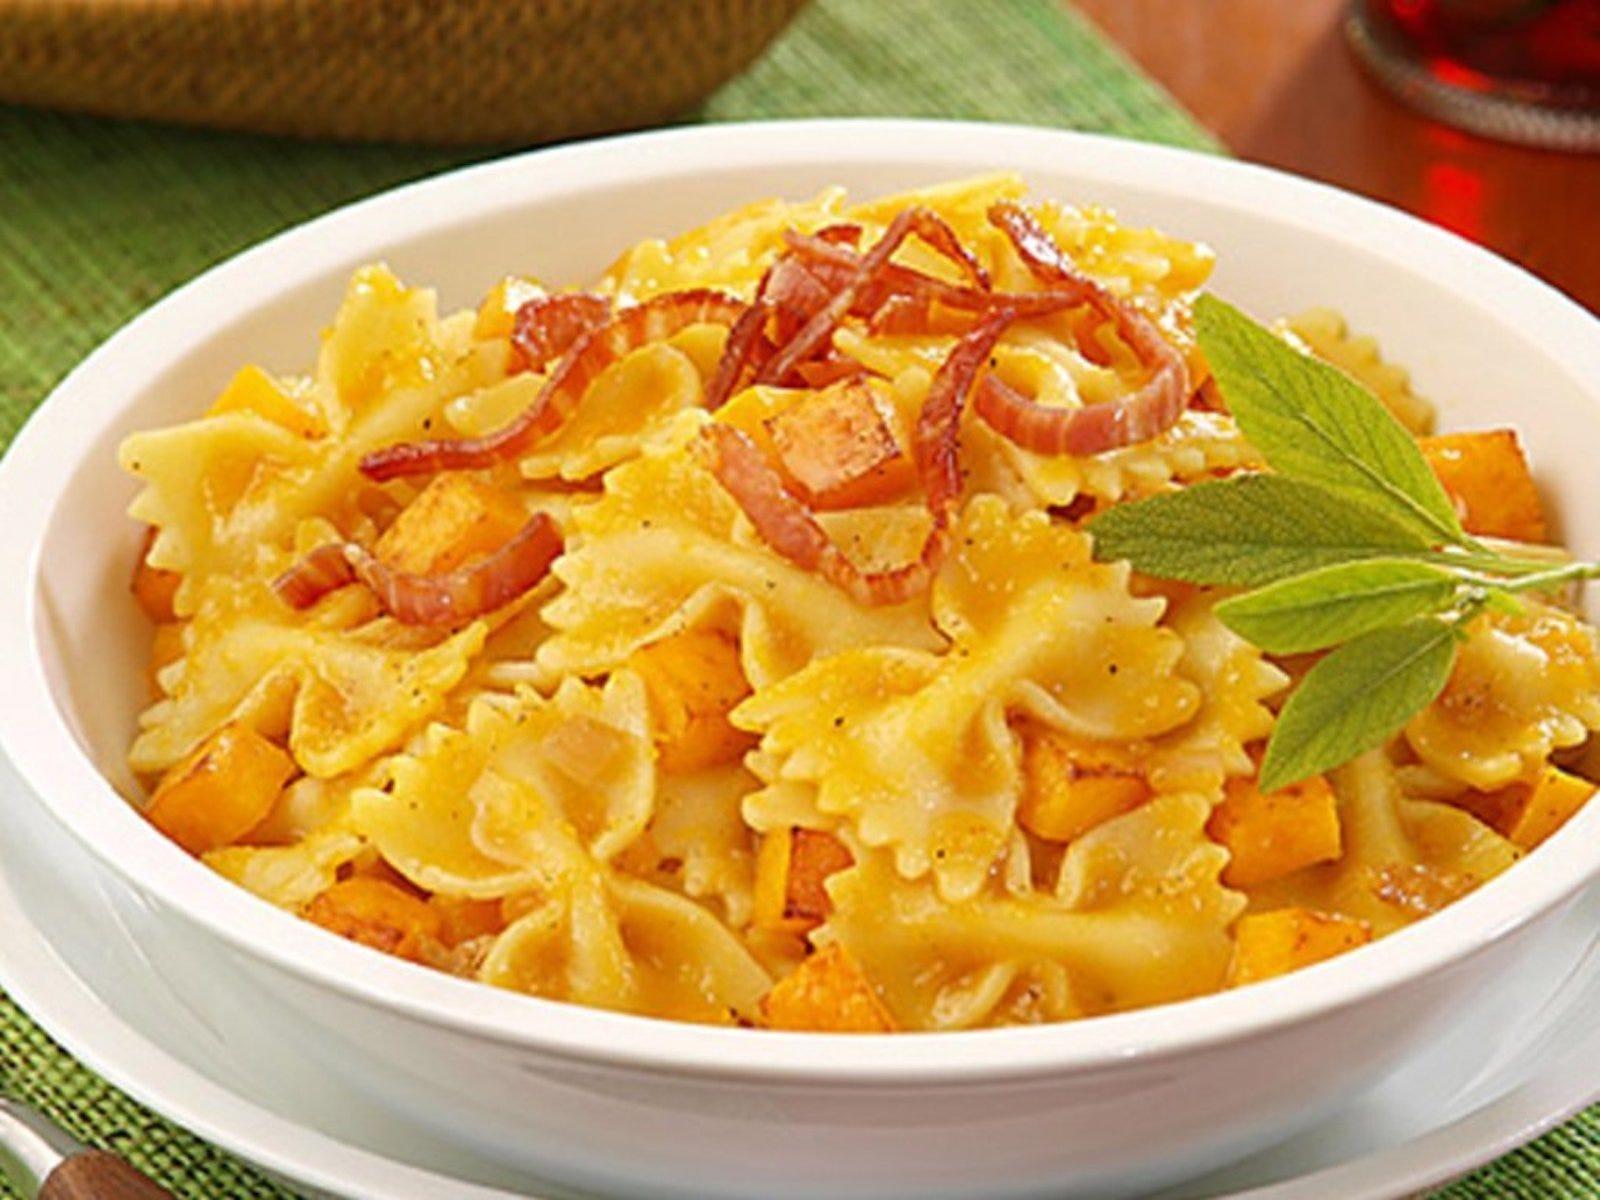 A dish of farfalle (bow-tie) pasta.